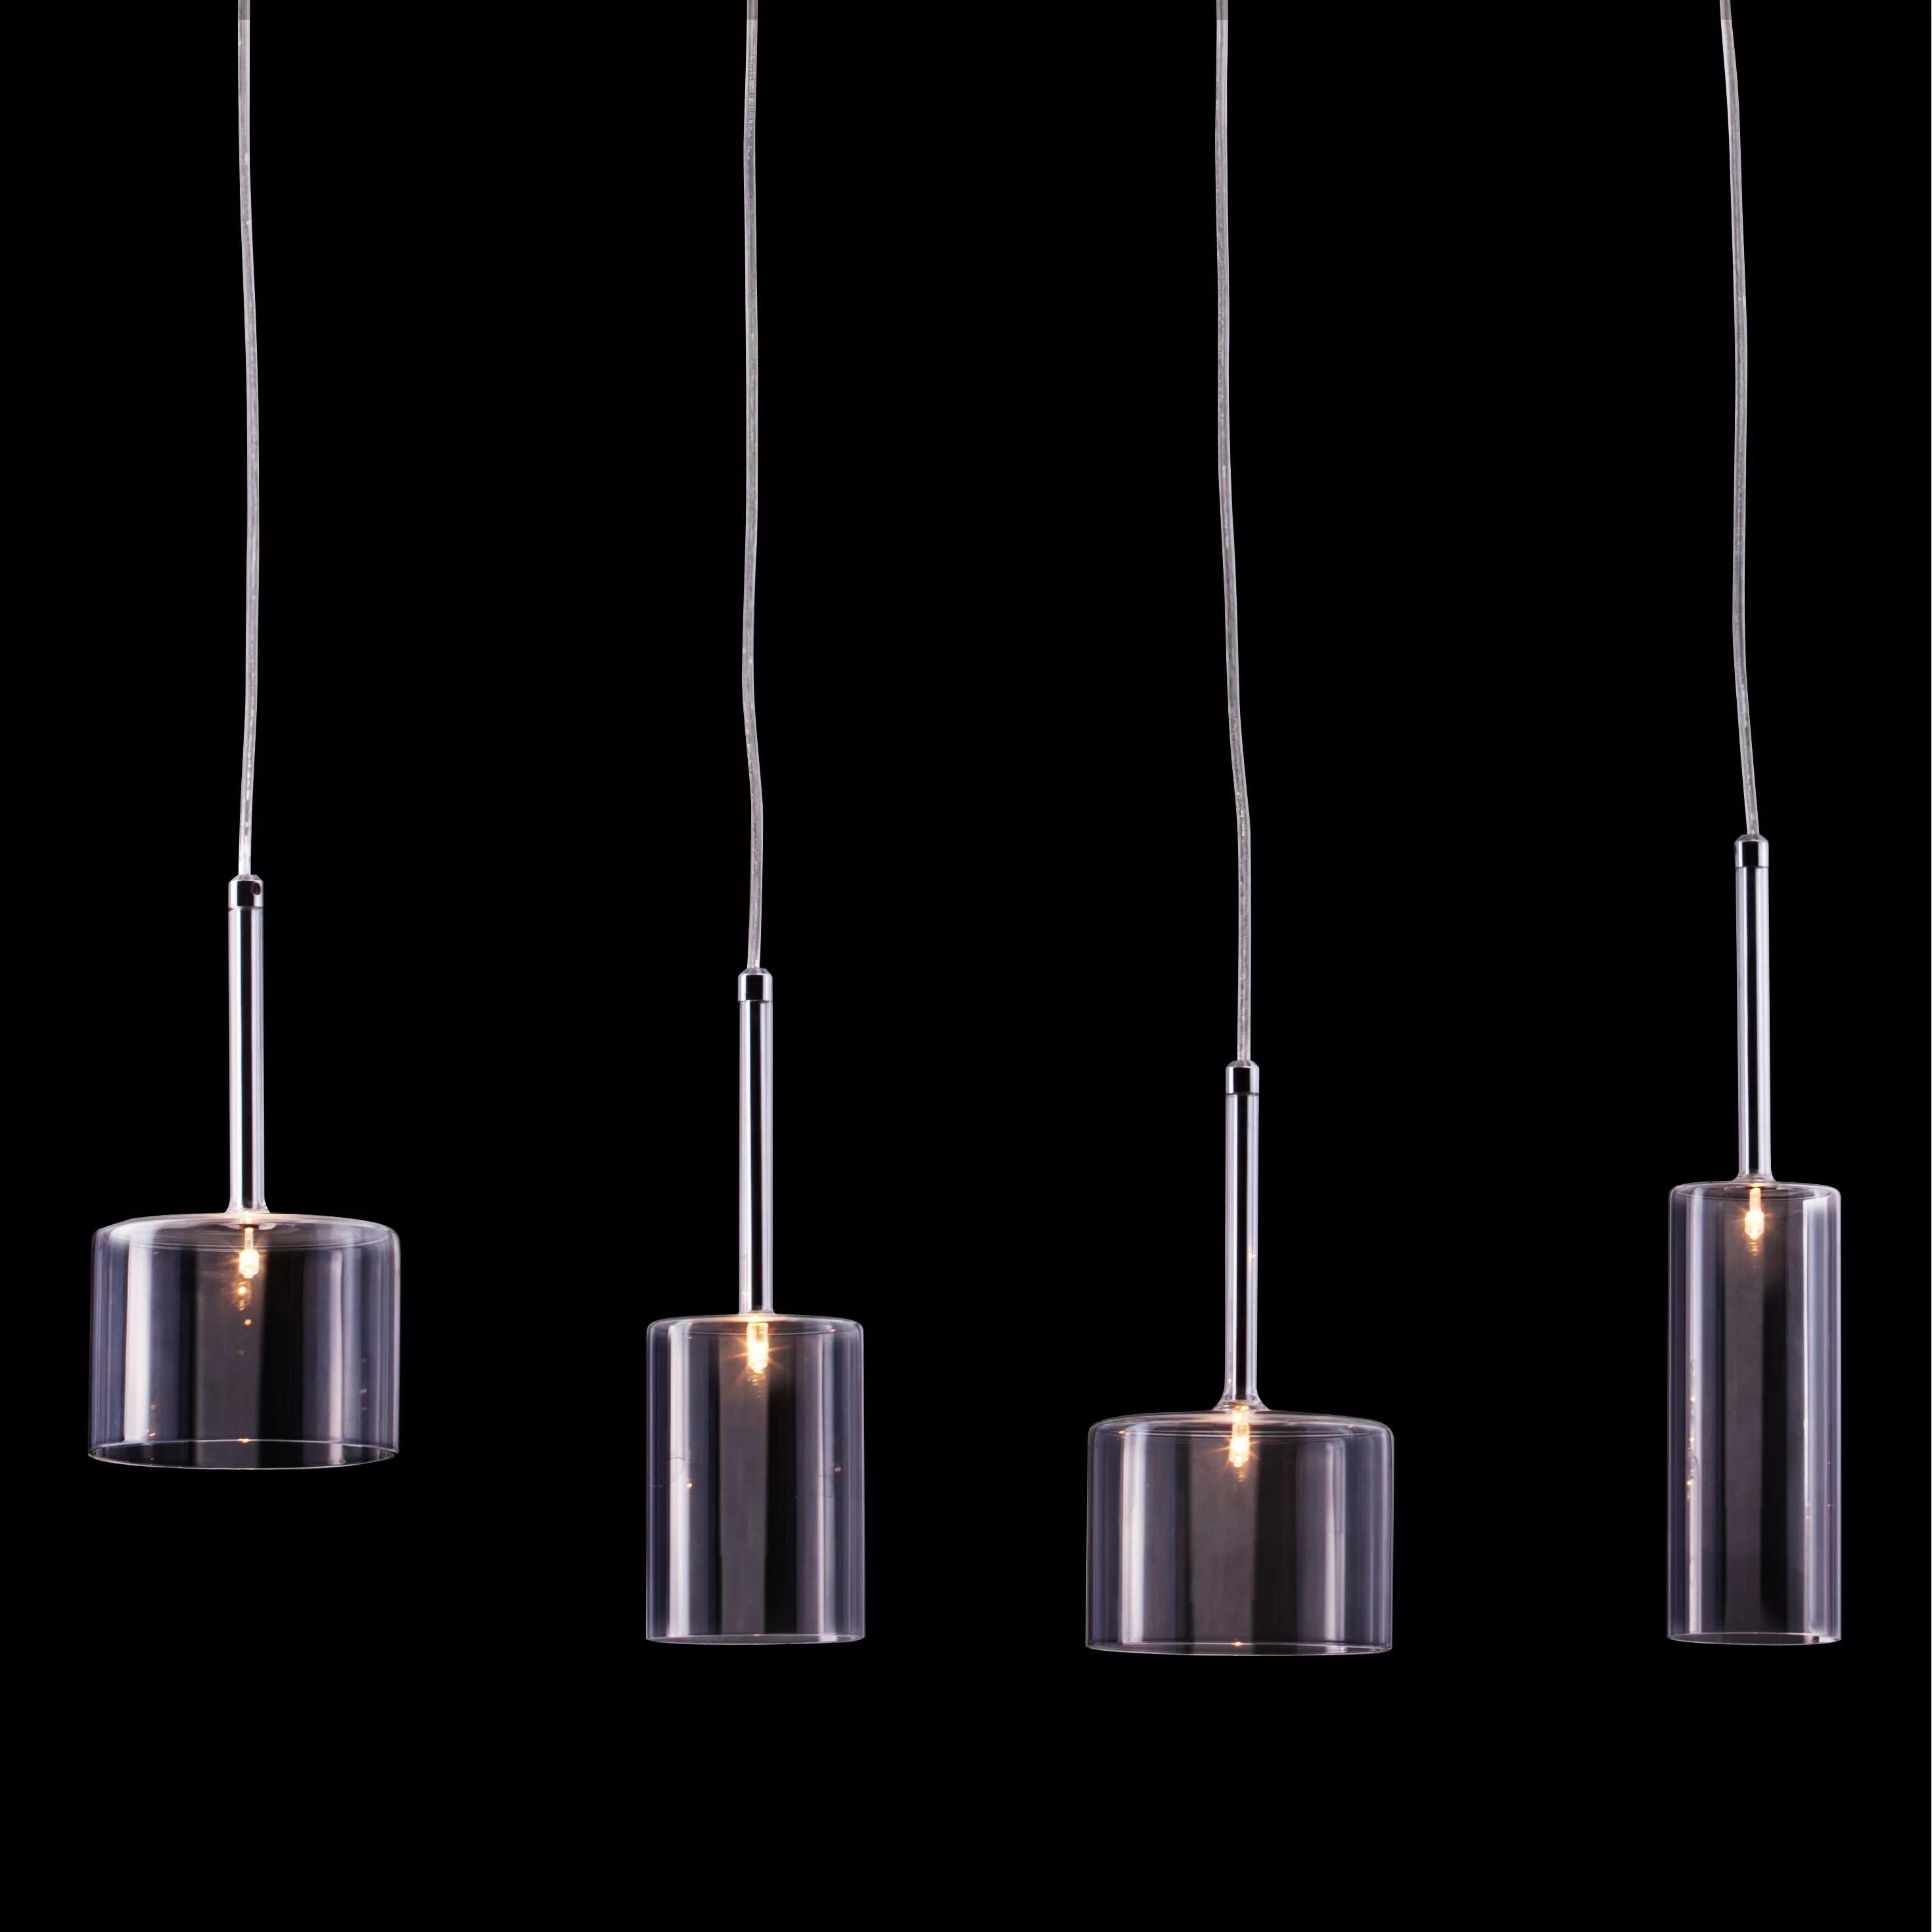 light pendants kitchen mixer reviews dcor design rain 4 island pendant and